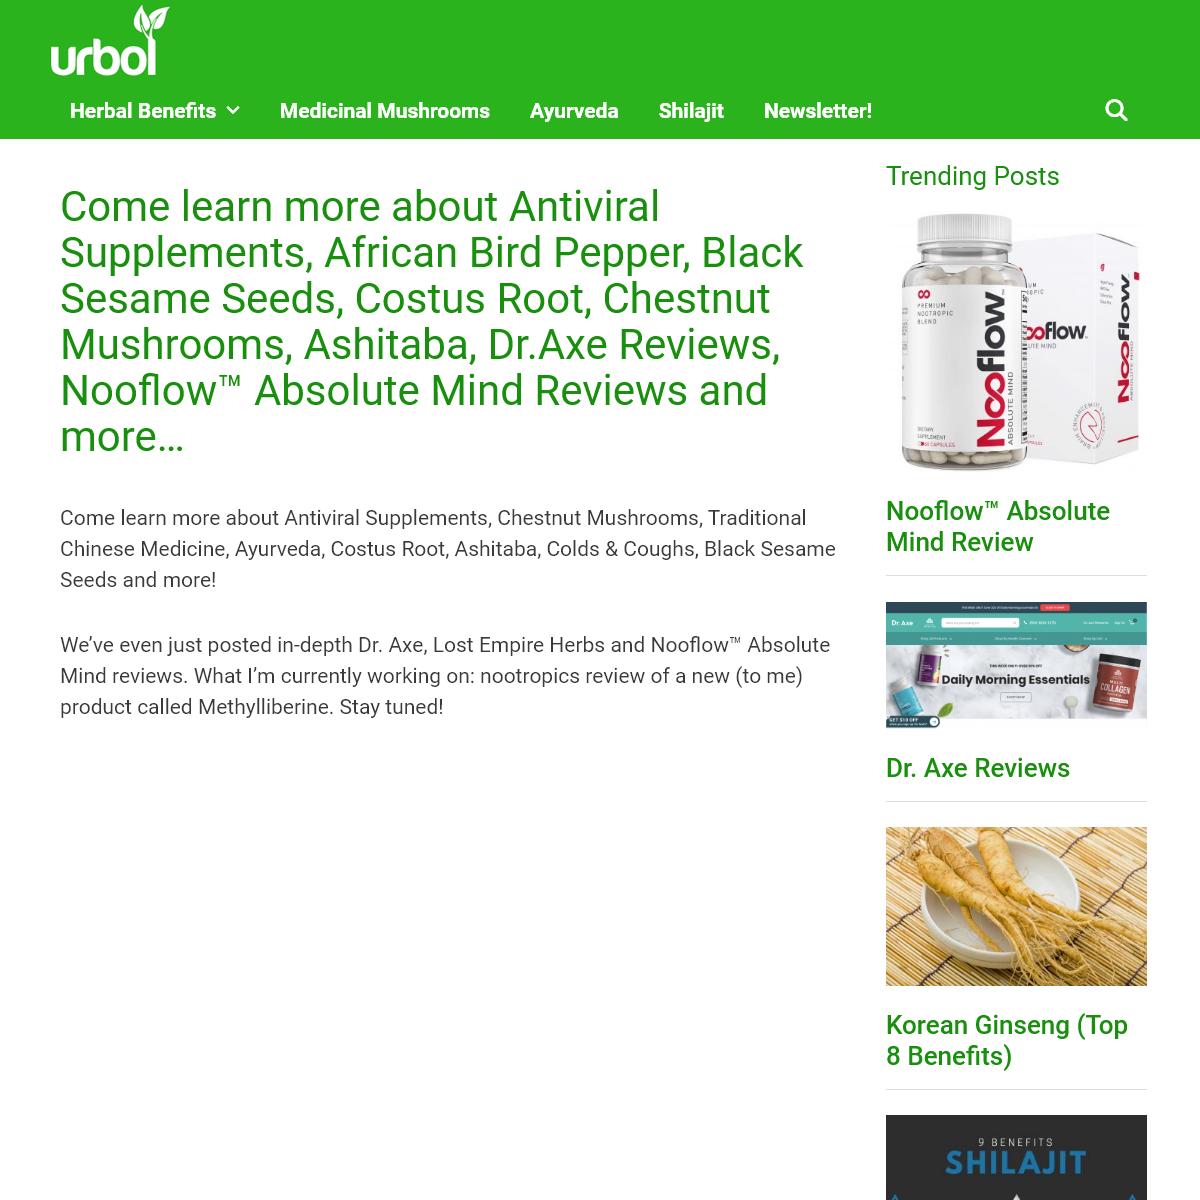 Latest Alternative Herbal Health News at urbol.com